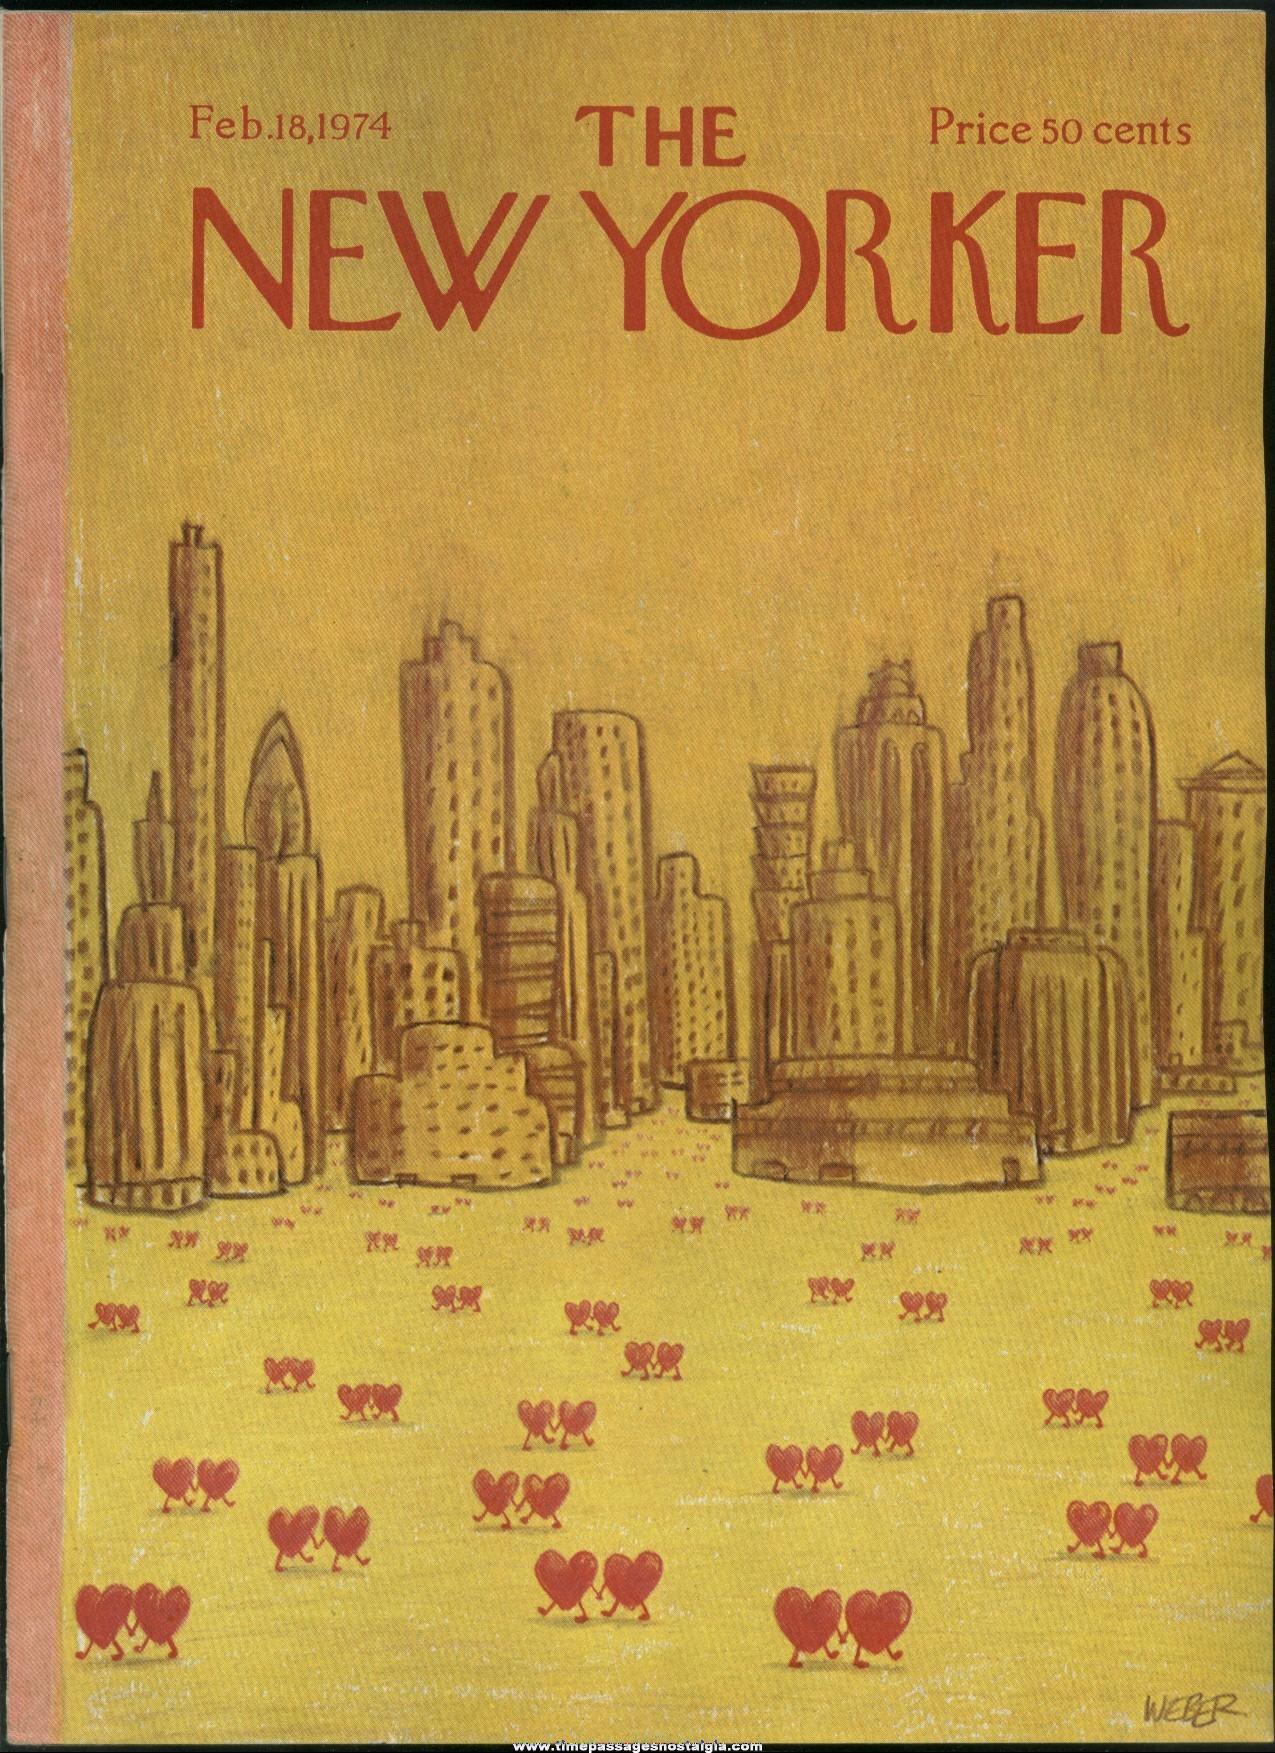 New Yorker Magazine - February 18, 1974 - Cover by Robert Weber